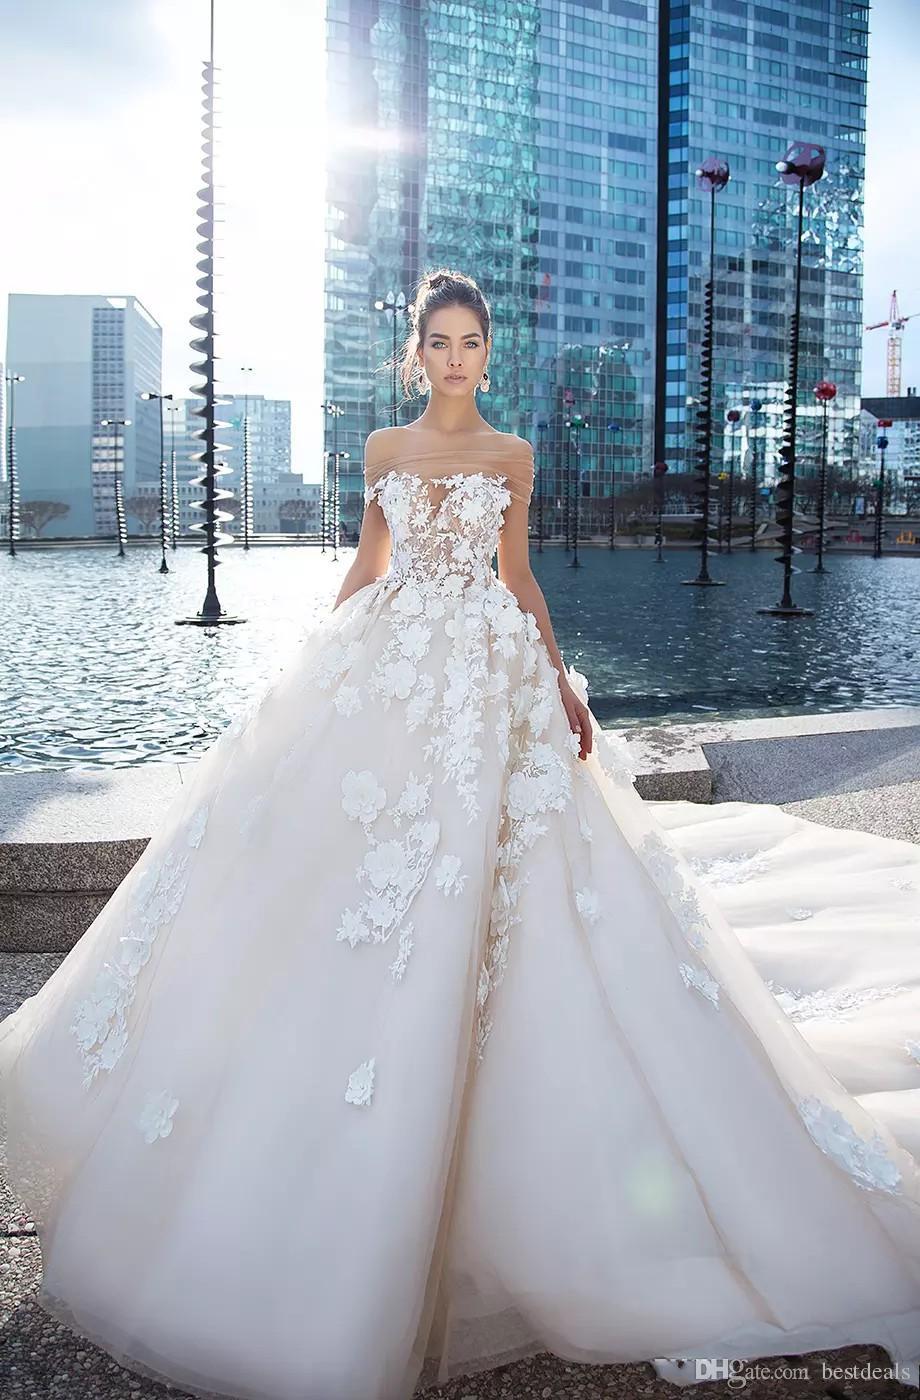 Discount Vintage 3d Lace Floral Wedding Dresses 2018 Dubai Retro Bridal Gowns Bateau Neck Covered Button Ball Gown Berta Bridal Dress Wedding Dresses Styles Wedding Gown Online From Bestdeals 241 36 Dhgate Com